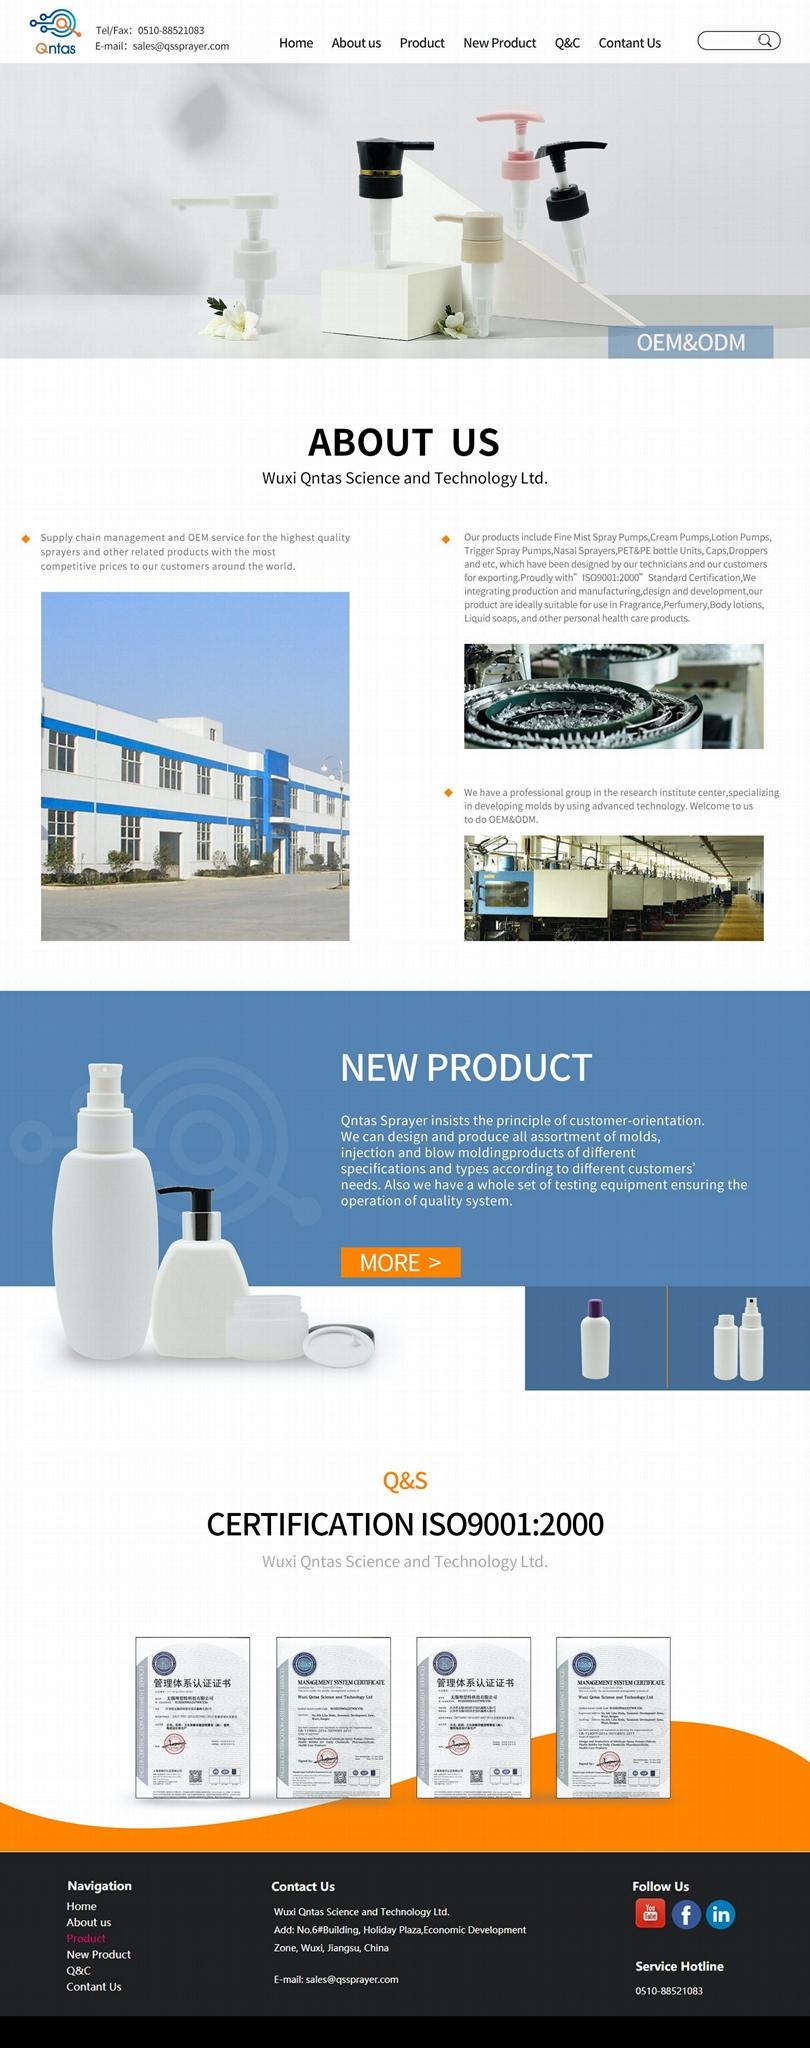 Cream pump sprayer CR-04 24410 C21N 0.4ML 3